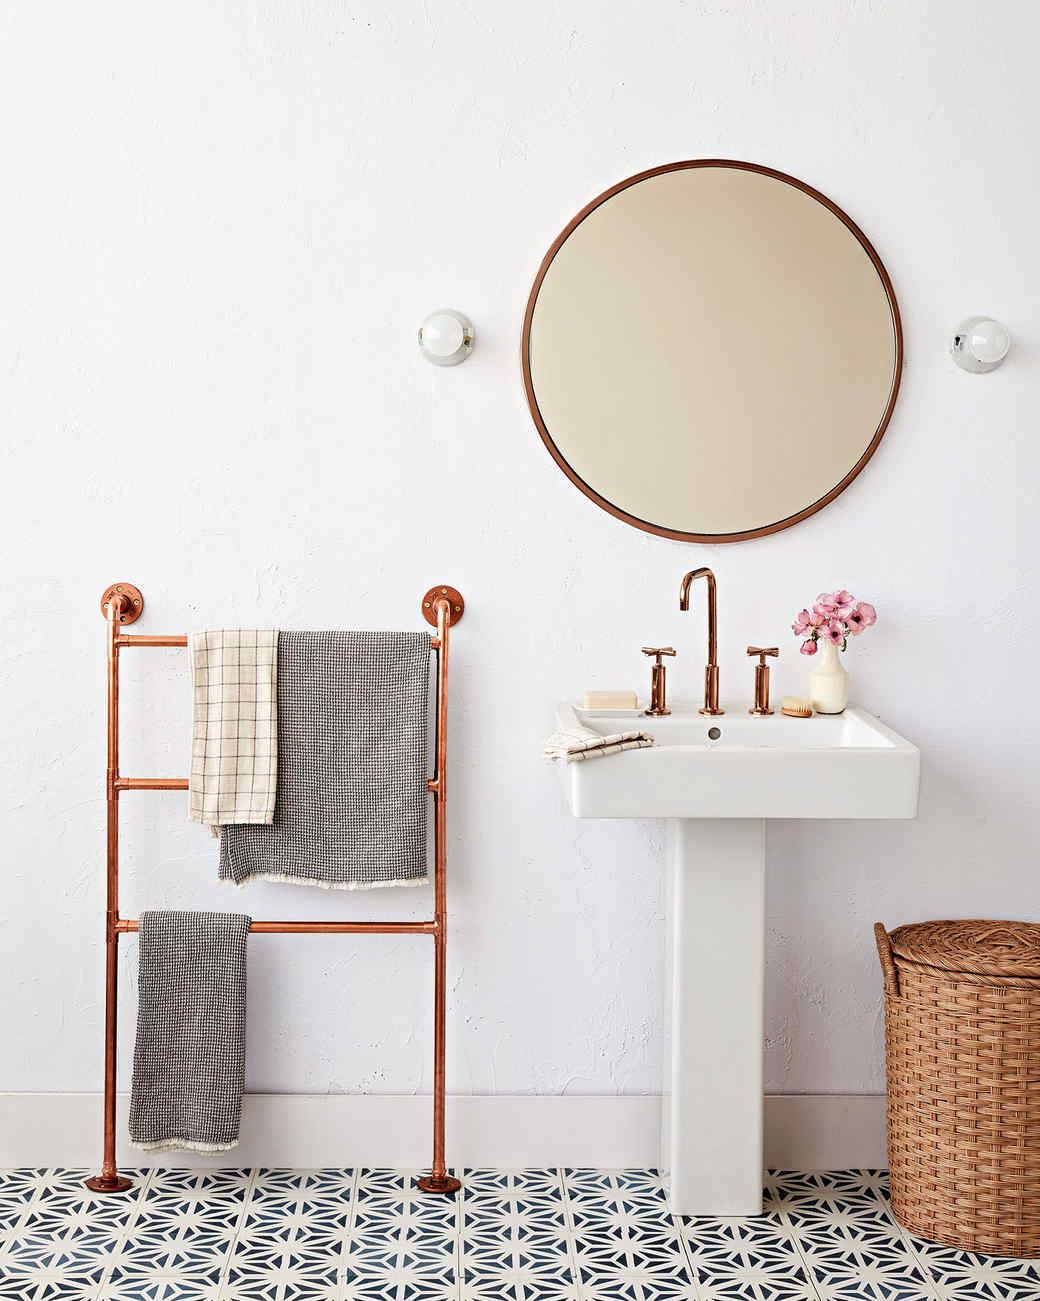 Copper-Pipe Towel Ladder